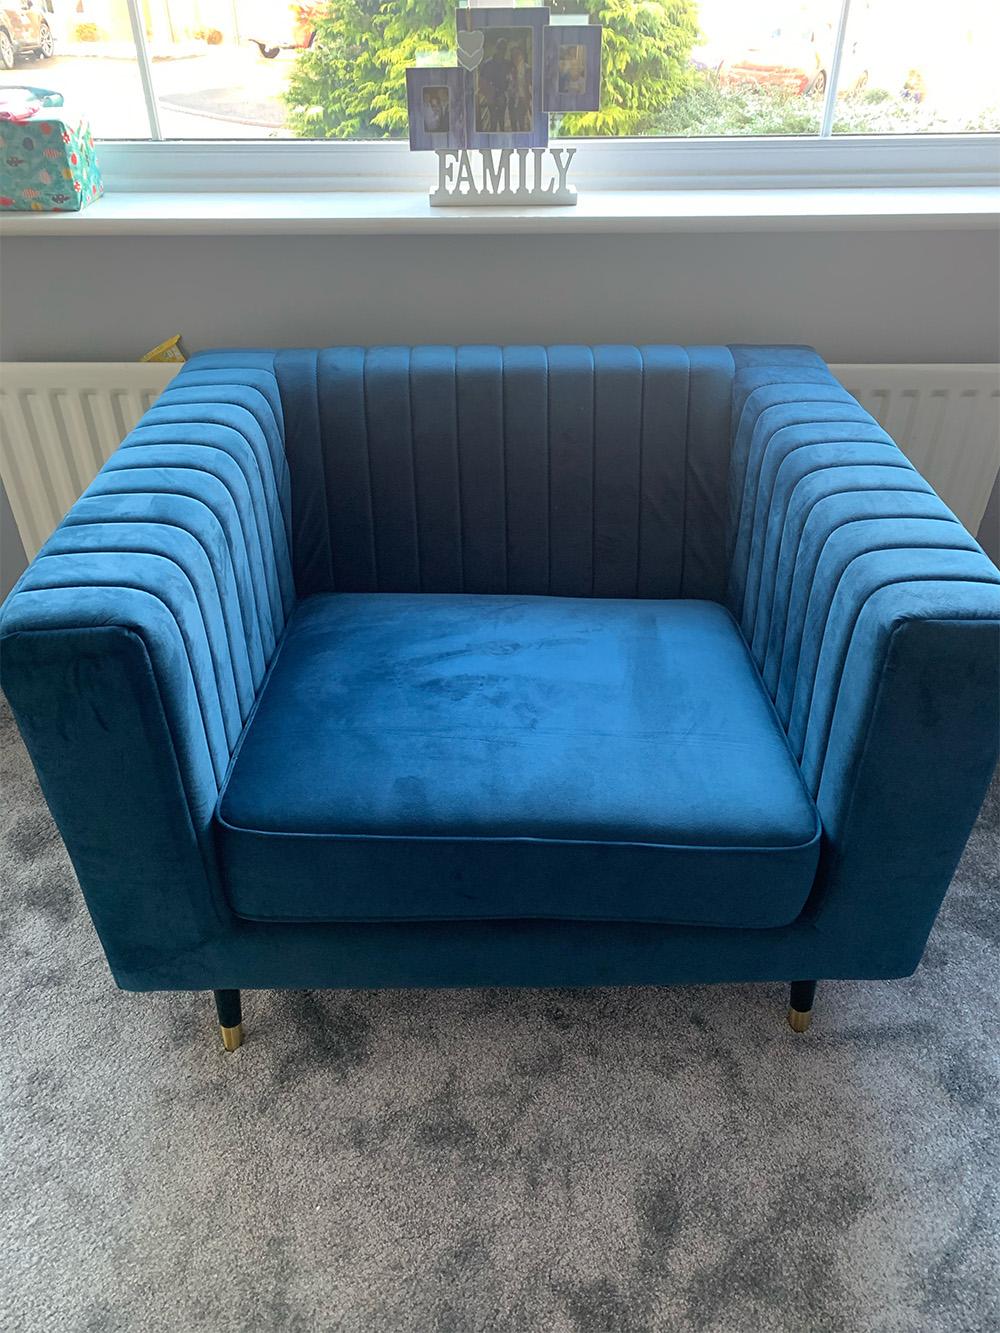 Navy blue Slender armchair